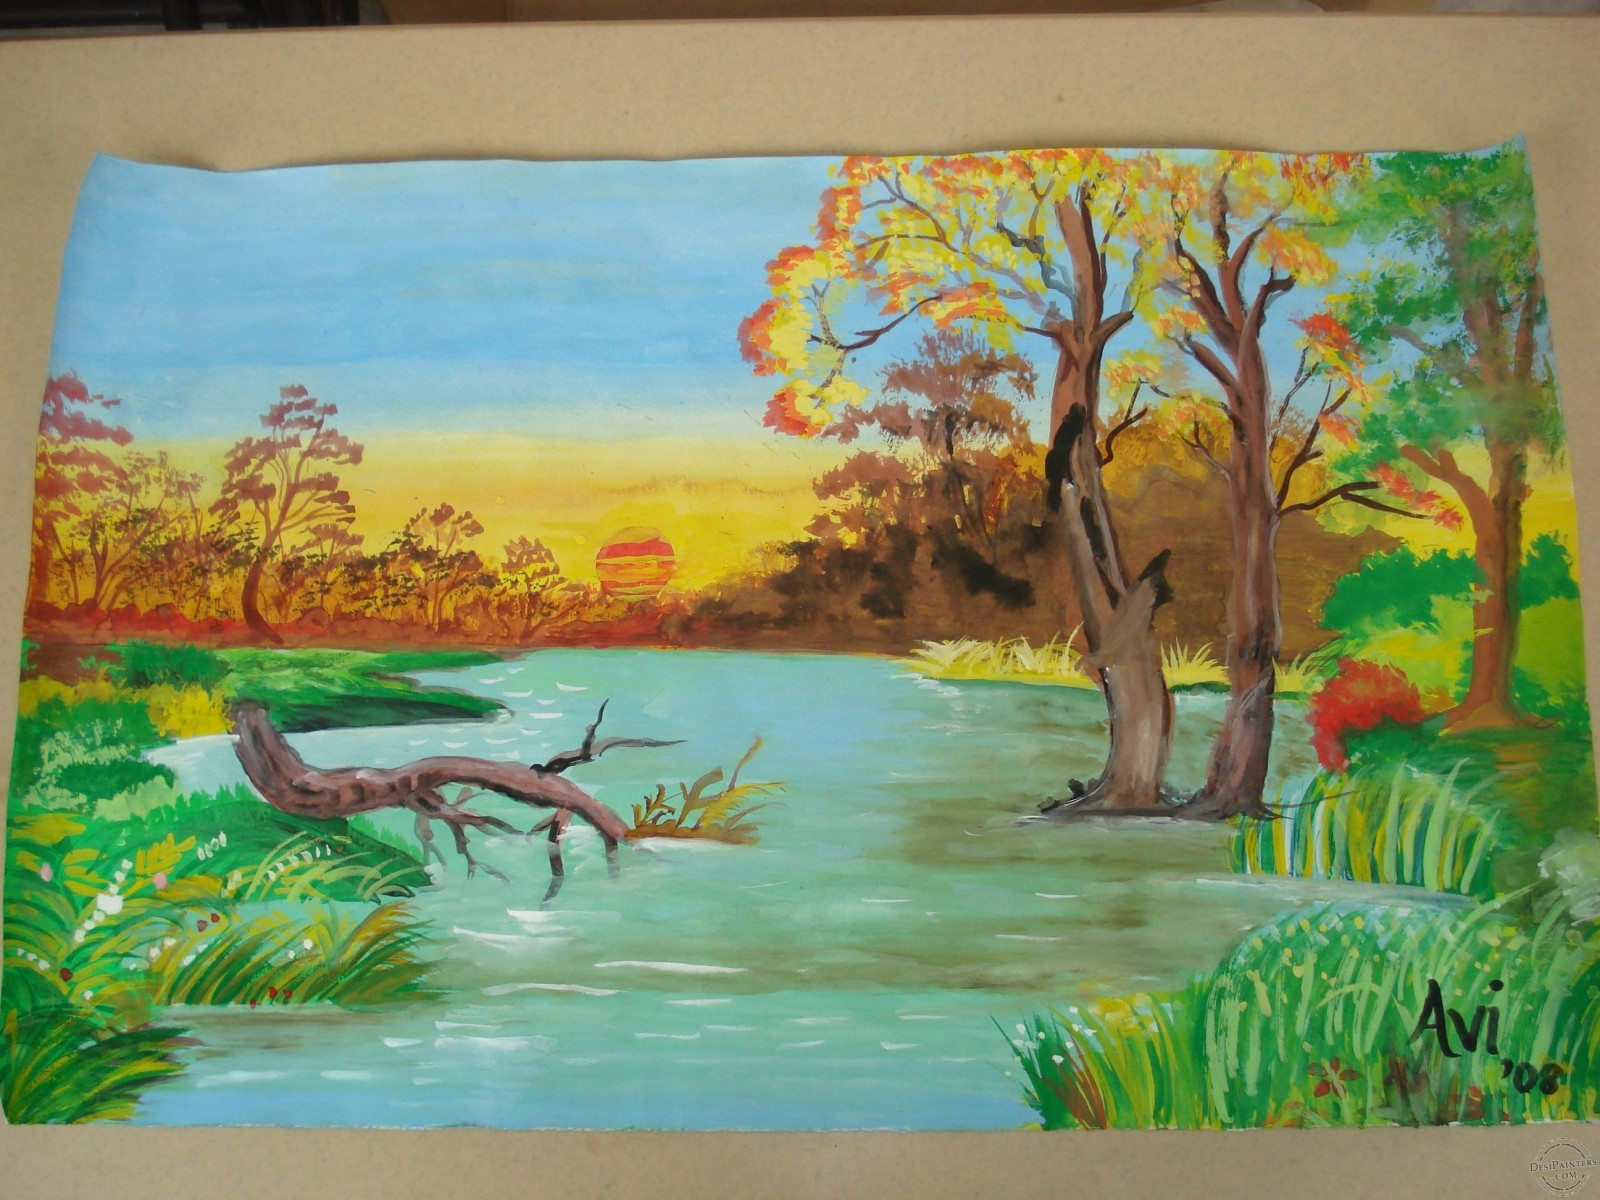 Drawn scenery crayon Watercolors Scenery Paintings made Avi